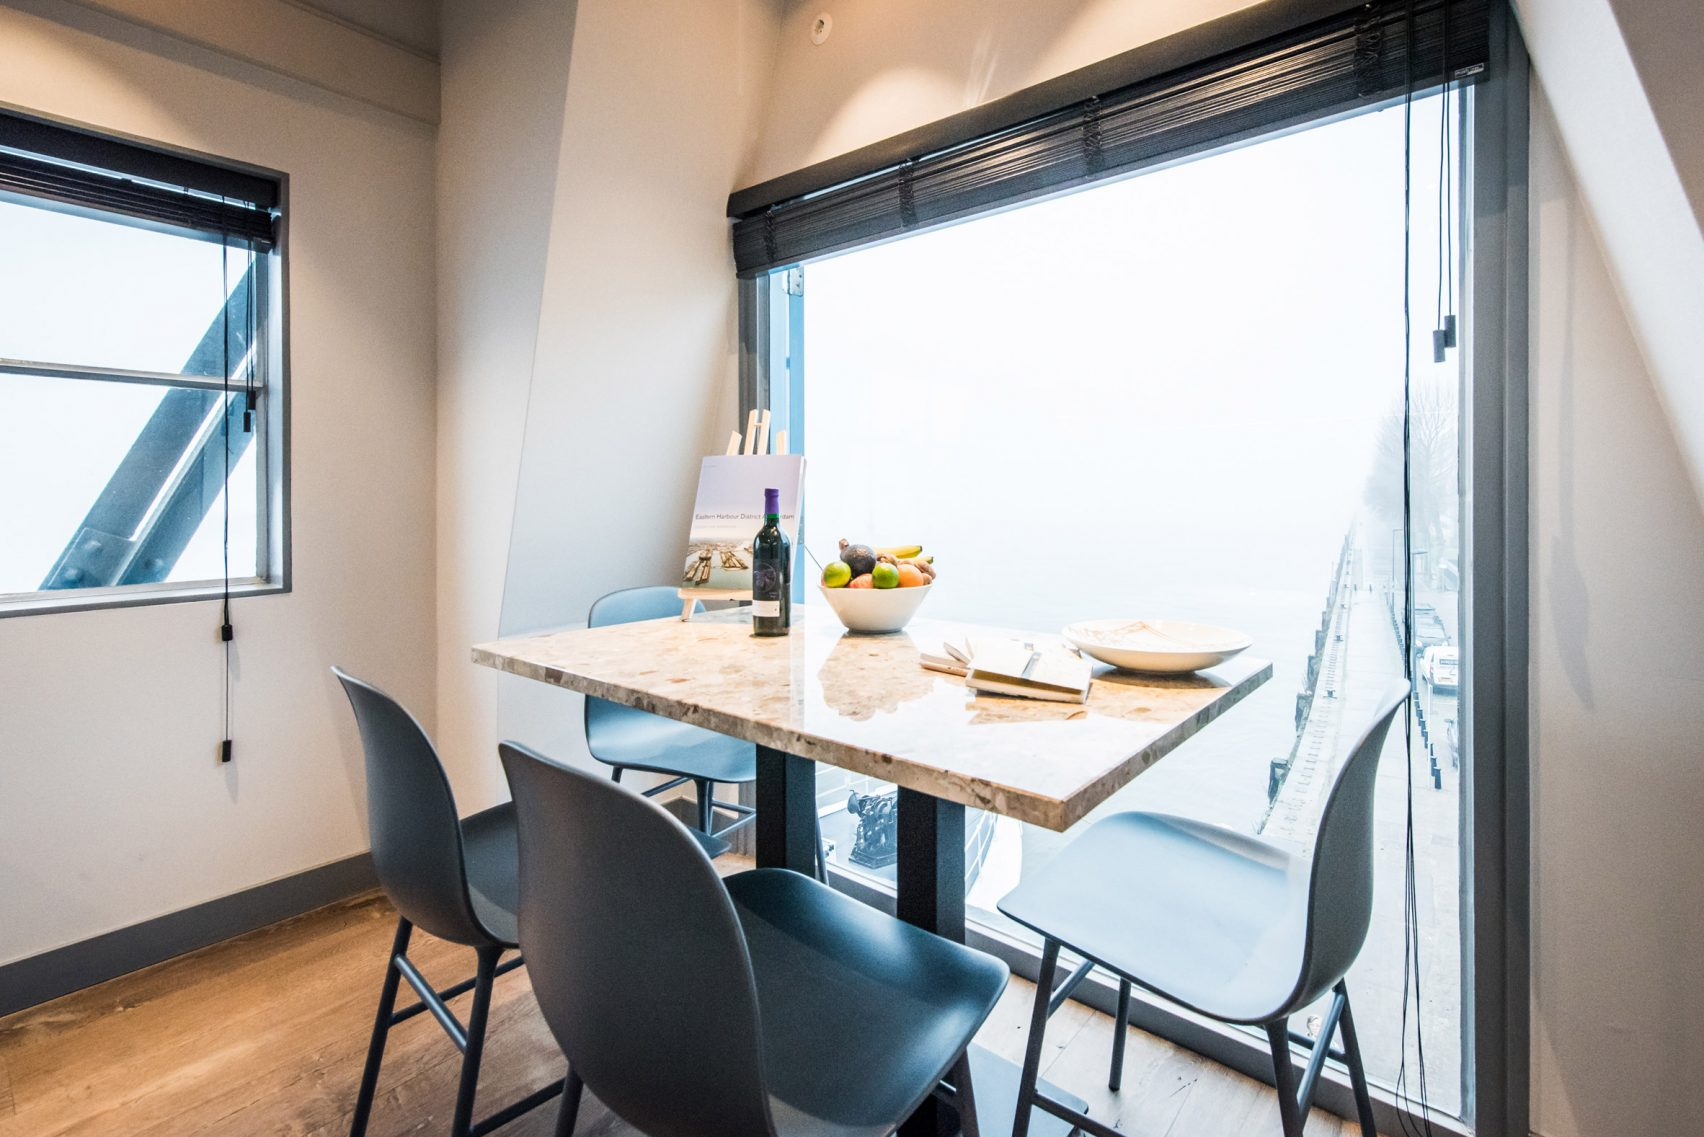 yays-crane-apartment-edward-van-vliet-architecture-interiors-netherlands_dezeen_2364_col_4-1704x1137